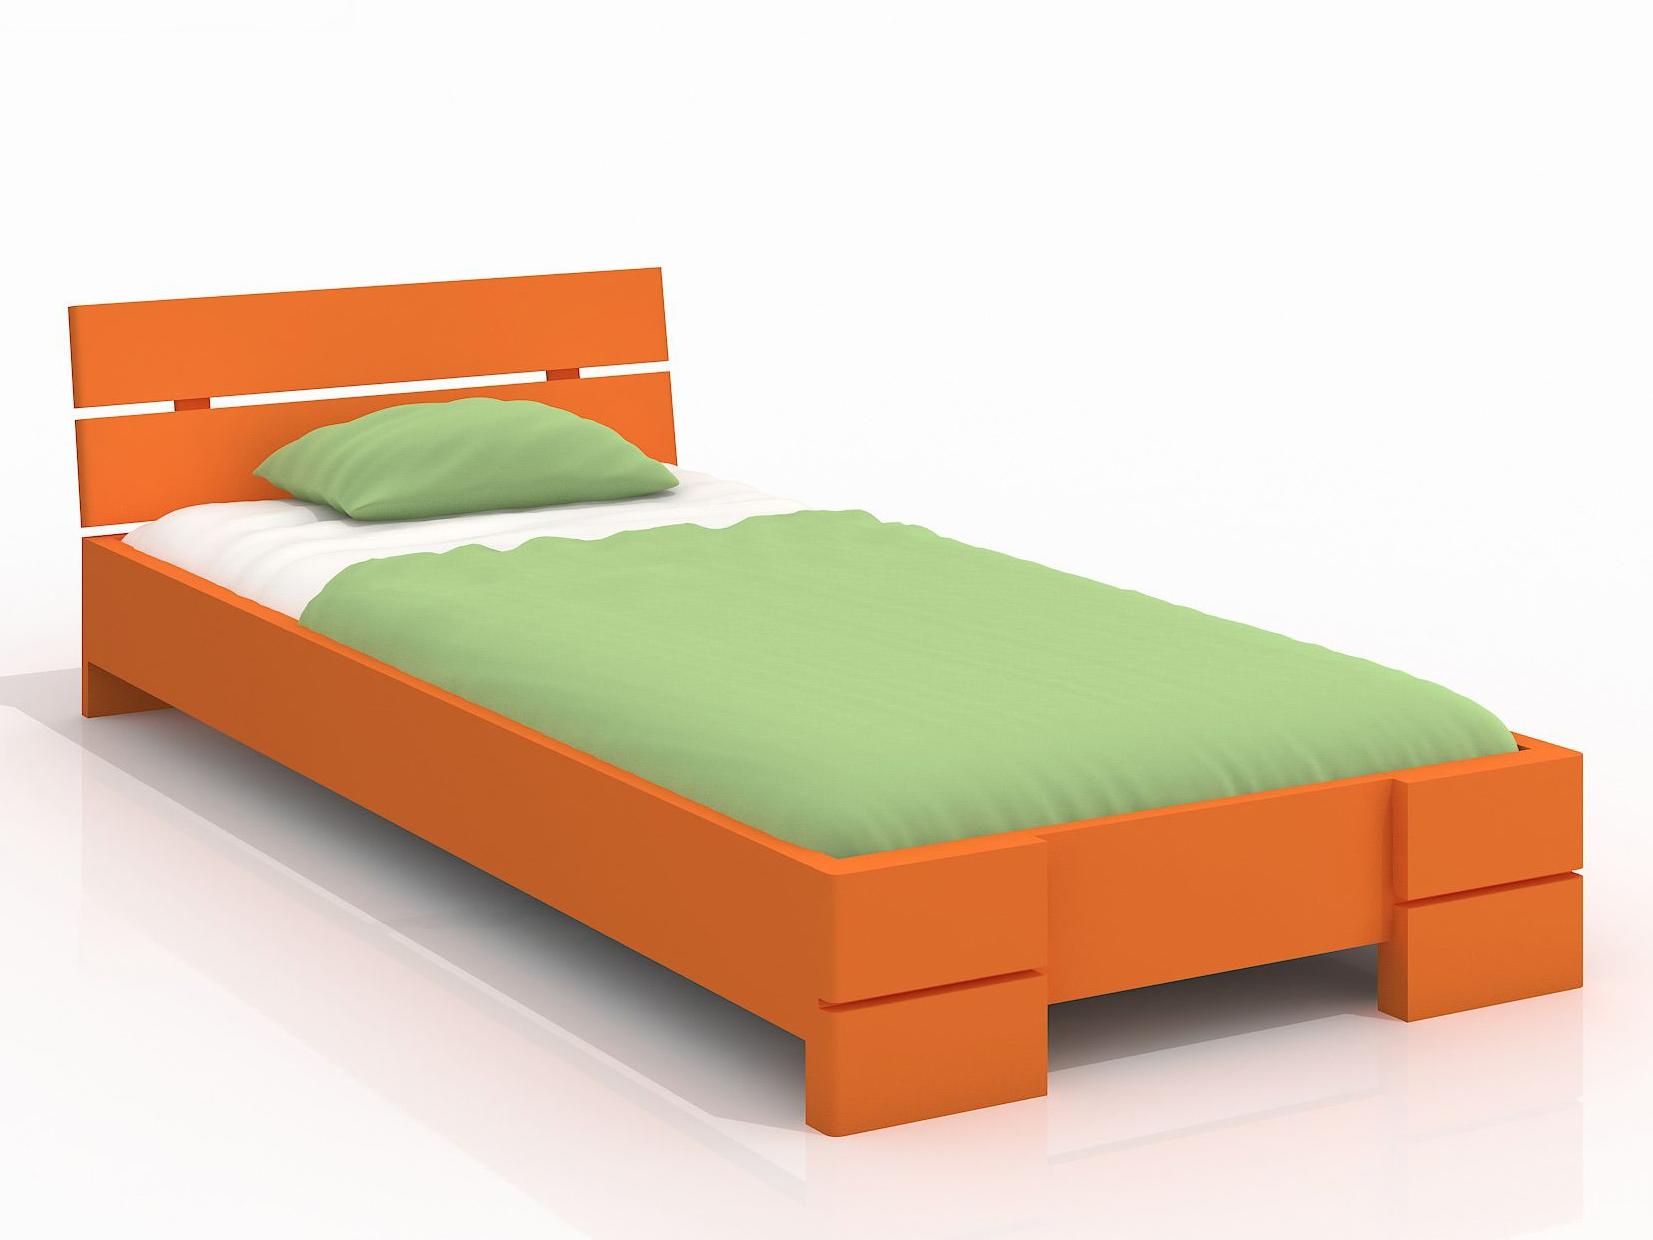 Jednolůžková postel 120 cm - Naturlig Kids - Lorenskog (borovice) (s roštem)